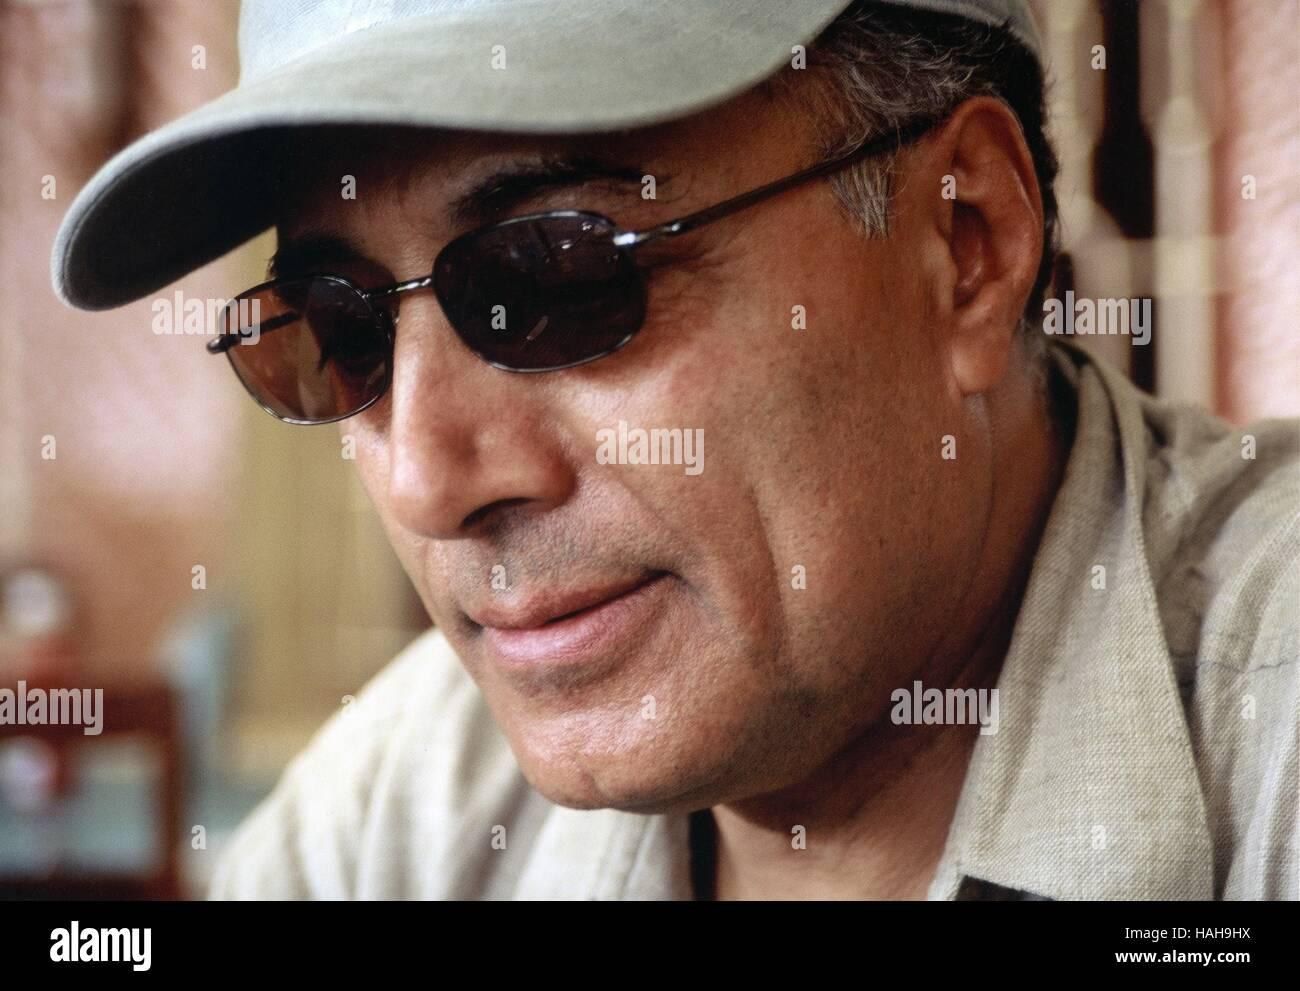 Ten Year : 2002 Iran Director : Abbas Kiarostami Abbas Kiarostami Shooting picture - Stock Image